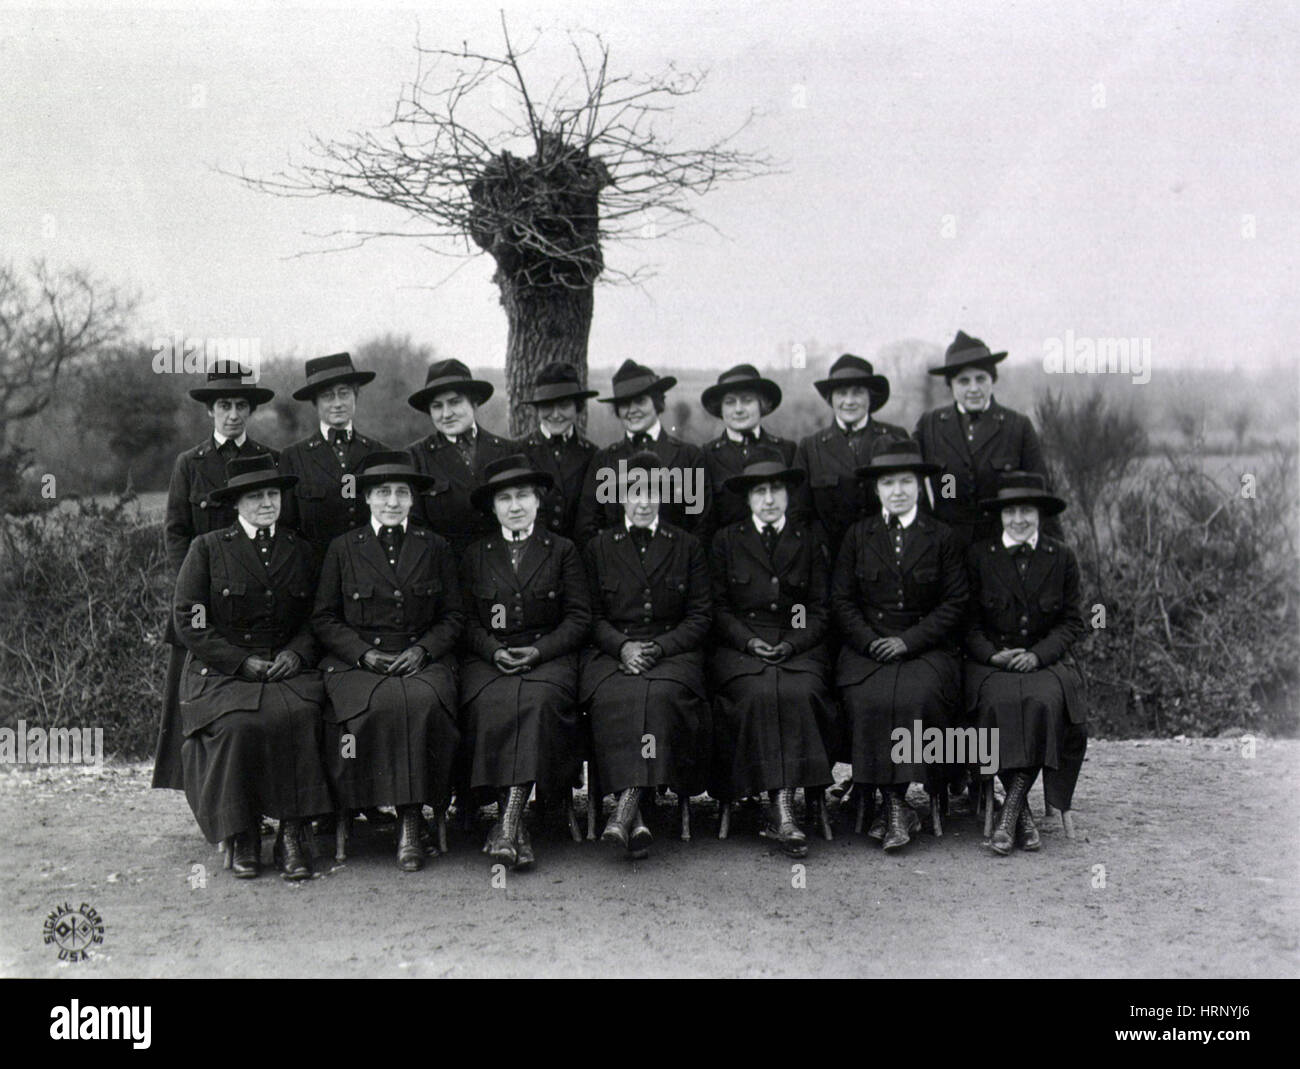 WWI, Nurses at U.S. Army Camp Hospital, 1918 - Stock Image